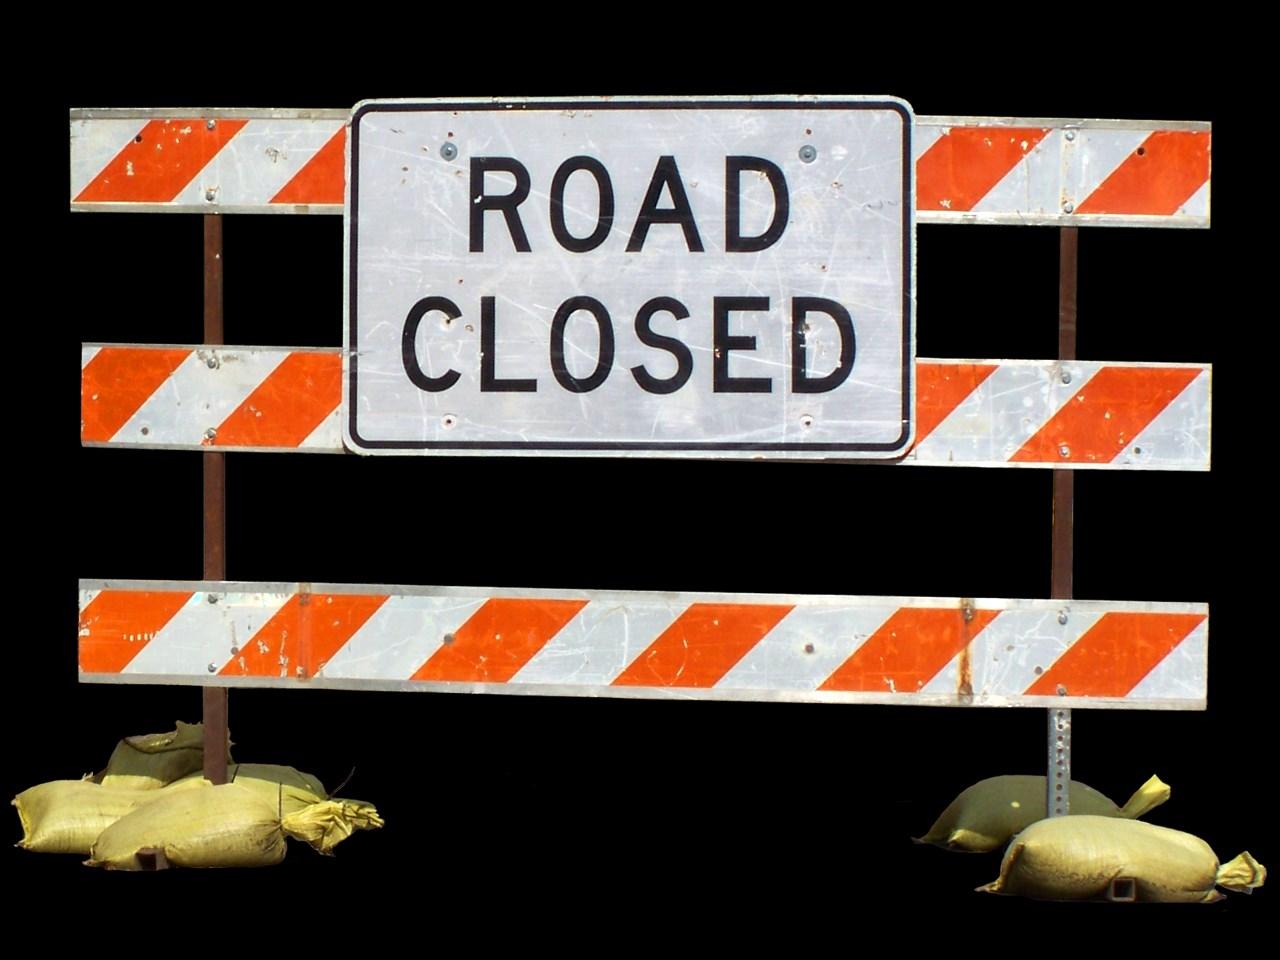 road closed_1490820486998.jpg